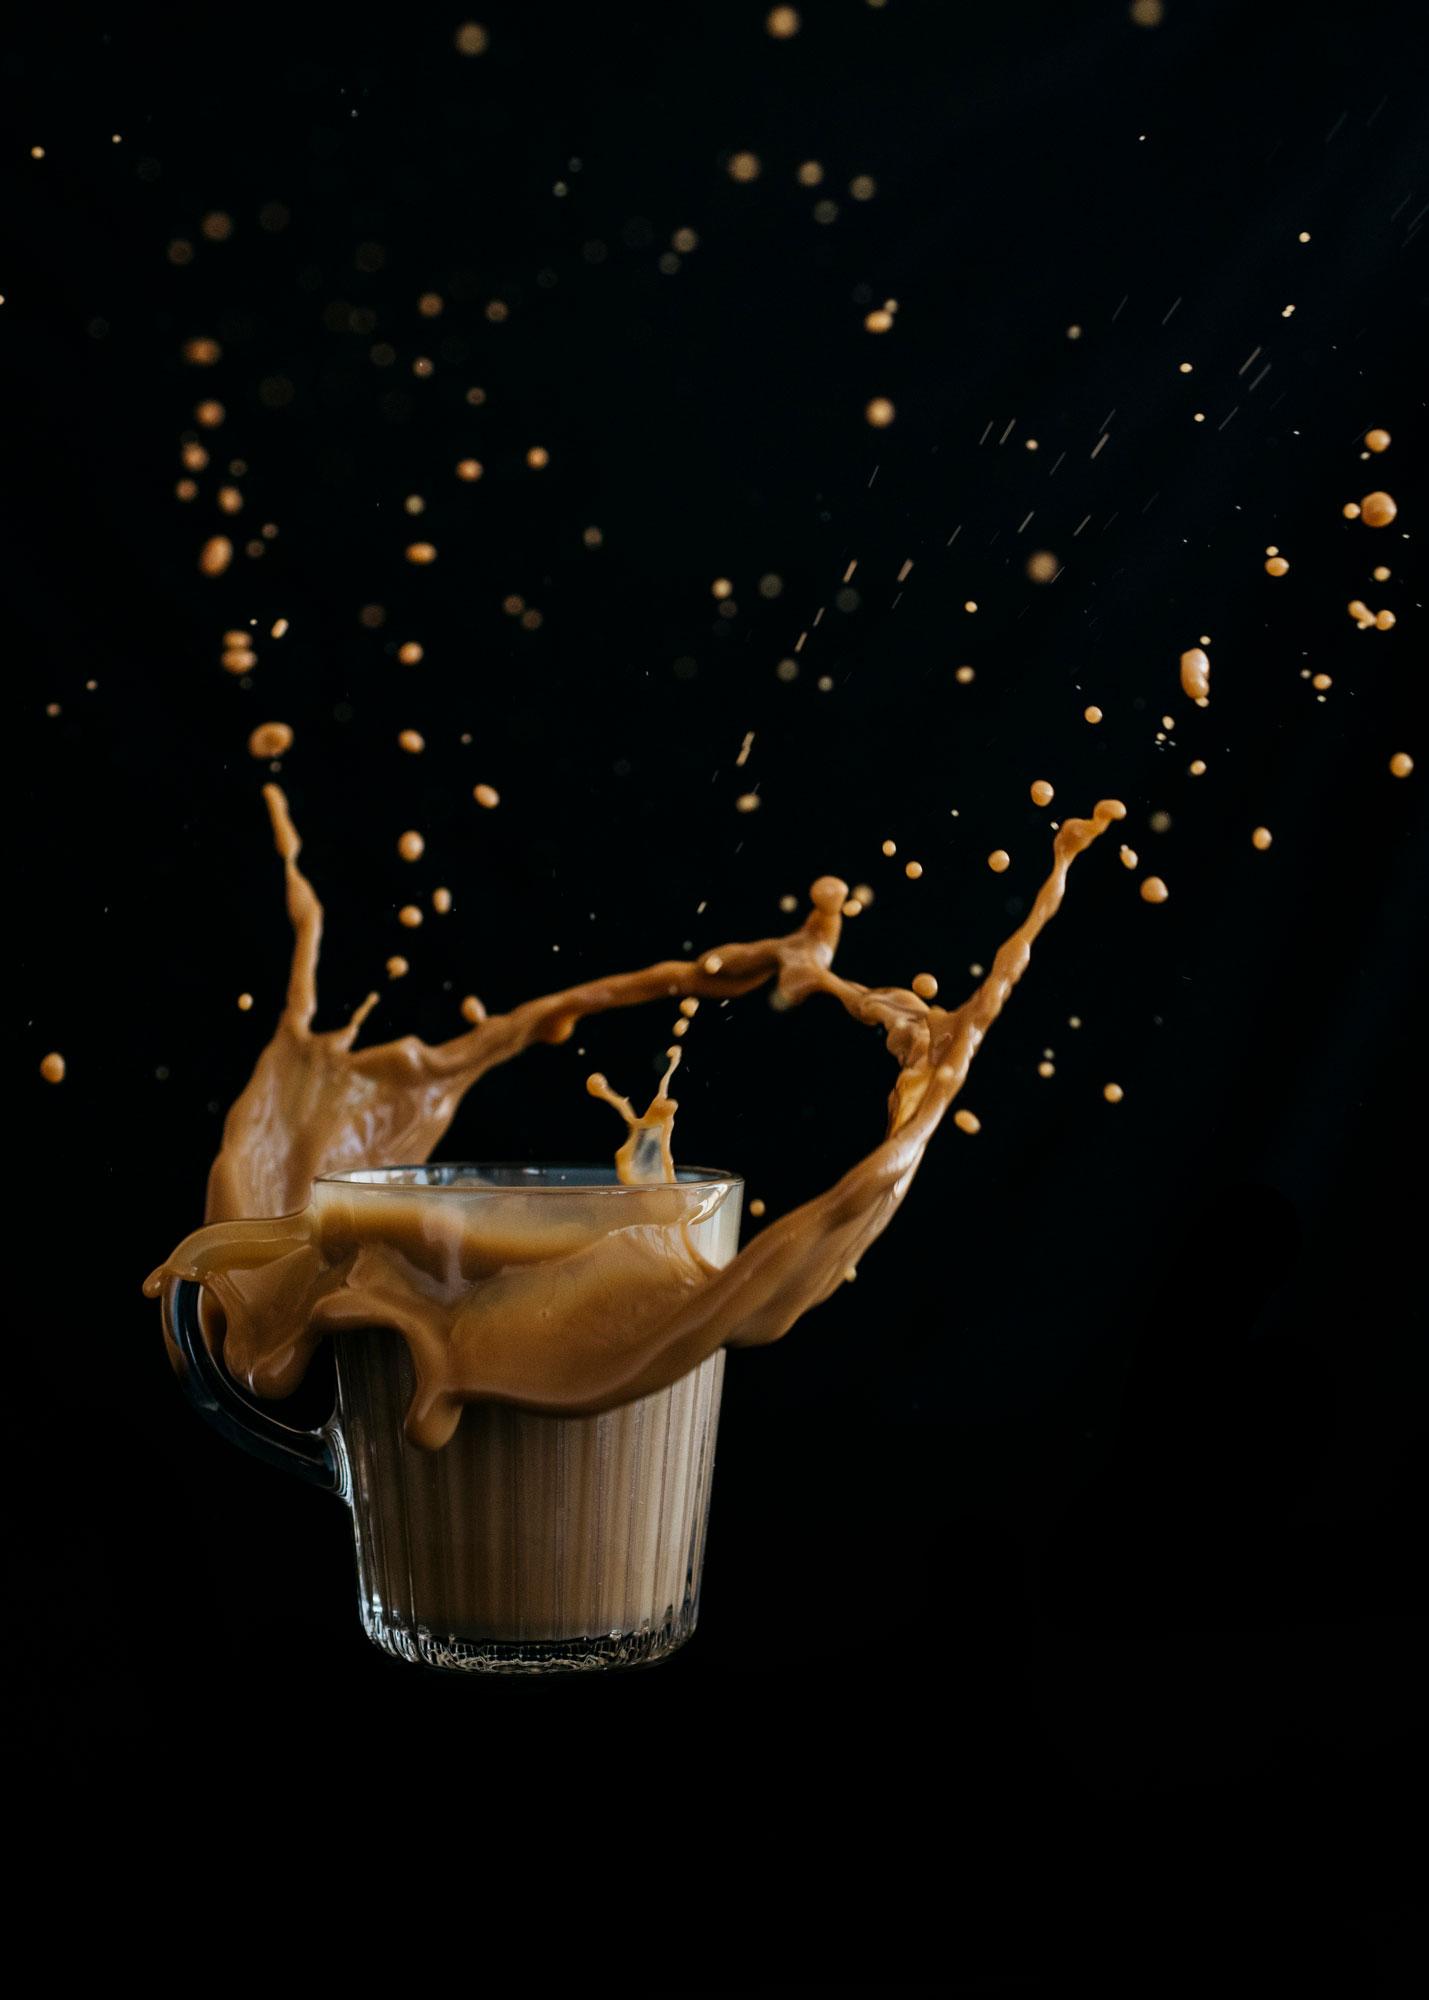 Starbucks Coffee Splash